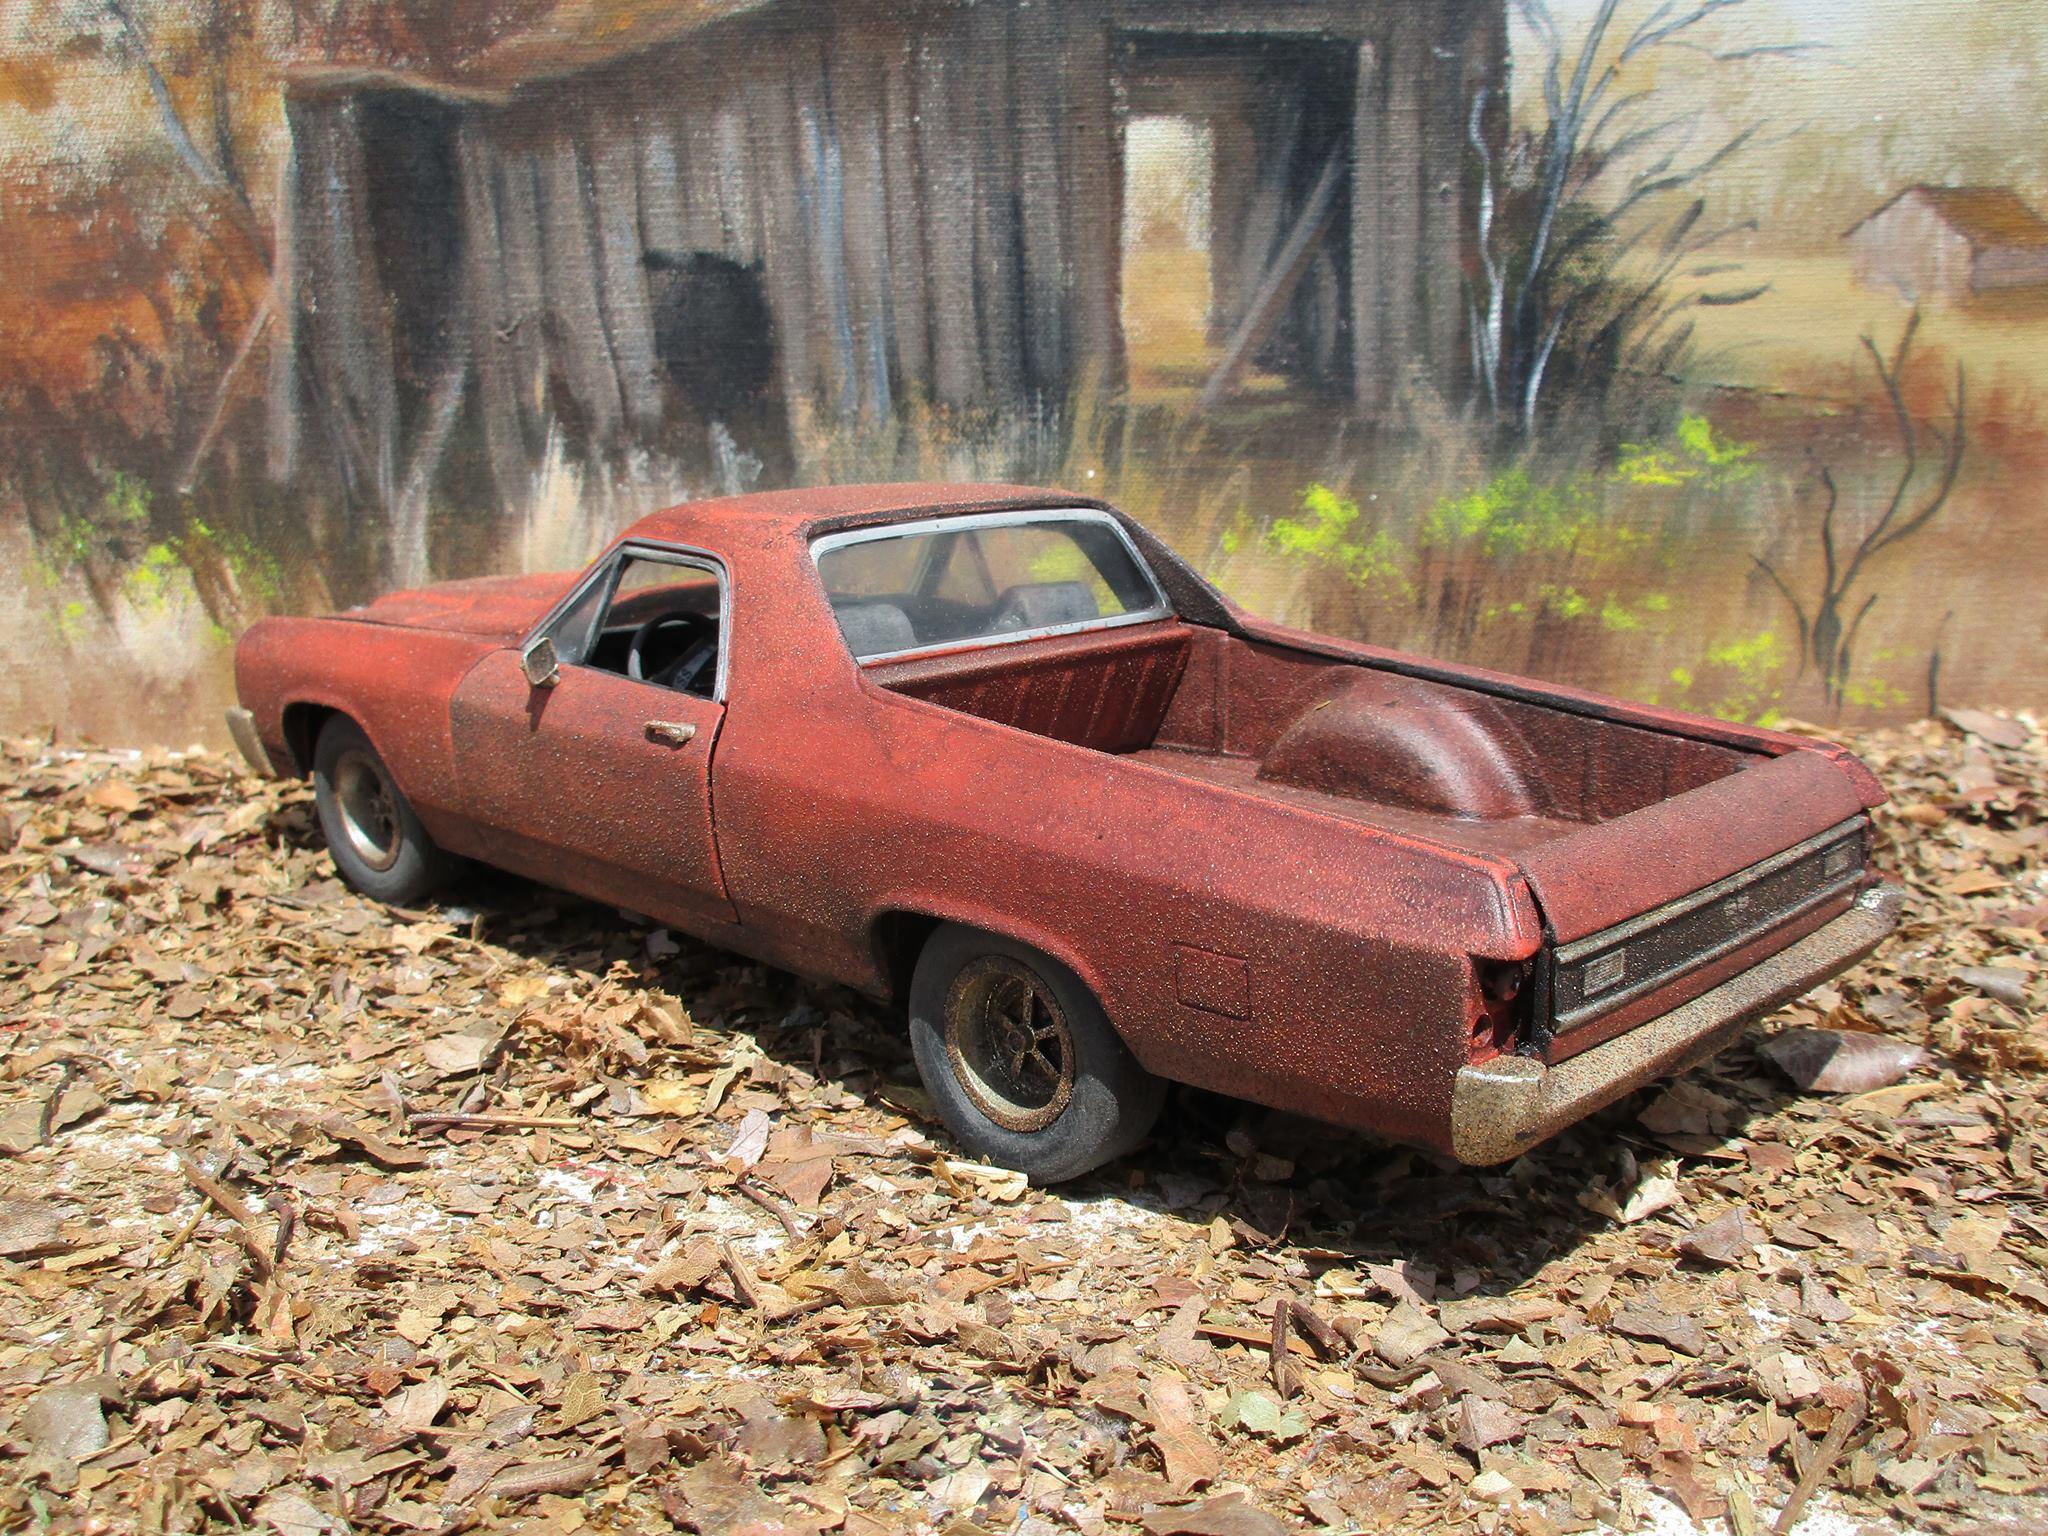 Chevy-elcamino-1971-2